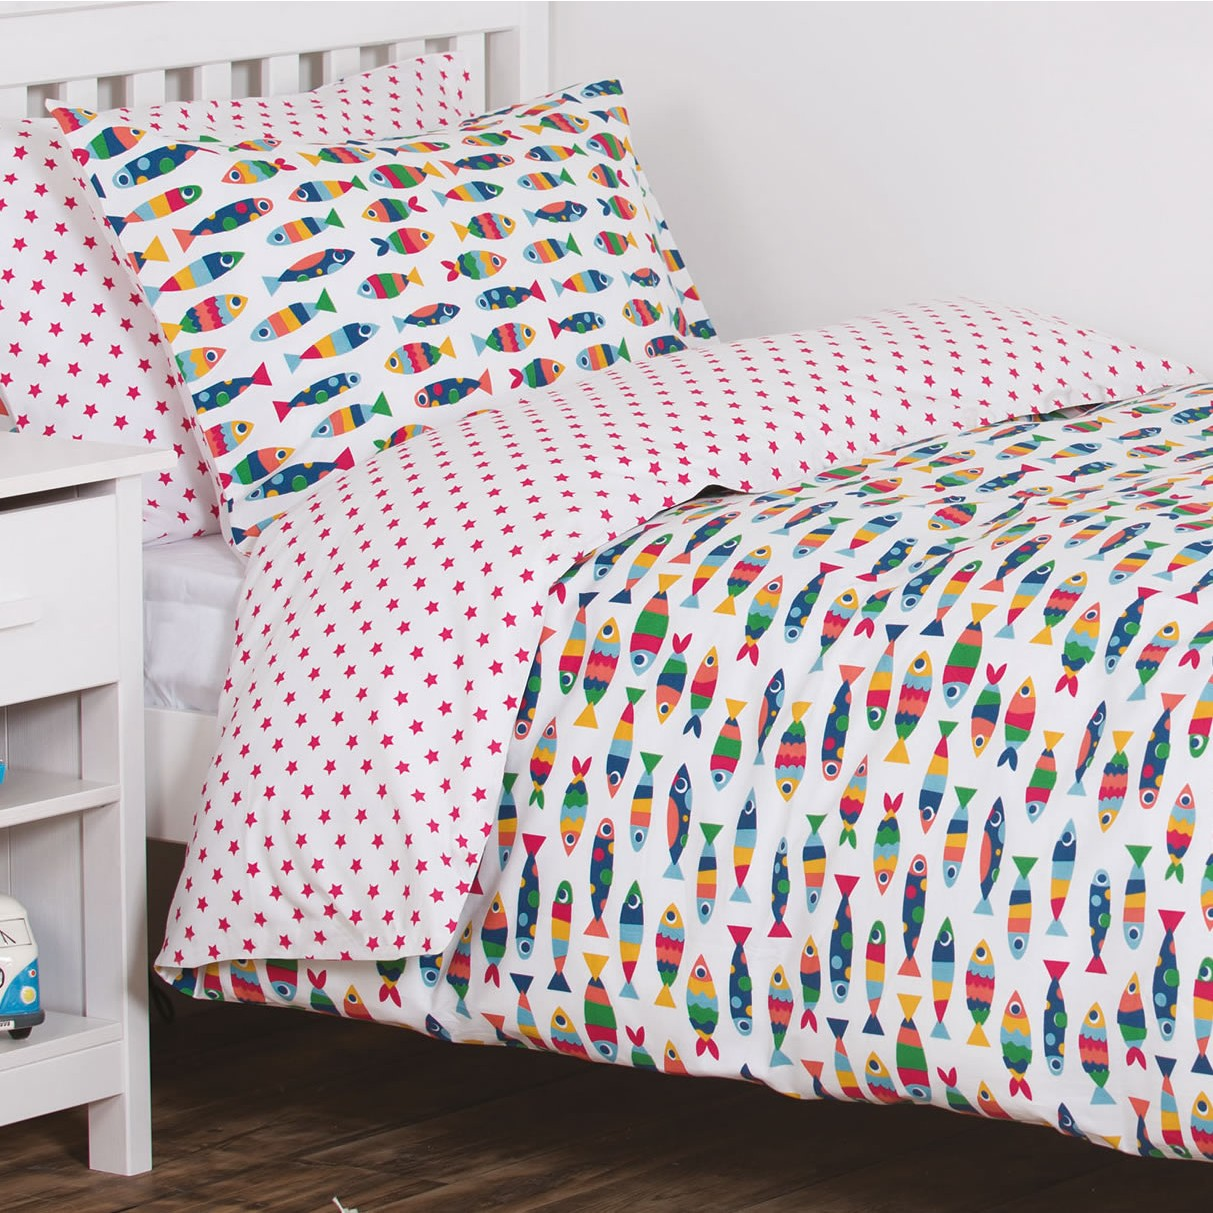 Purple Bedroom Lighting Espresso Bedroom Sets Bedroom Door Curtain Ideas Diy Bedroom Curtain Ideas: Rainbow Fish Bedding